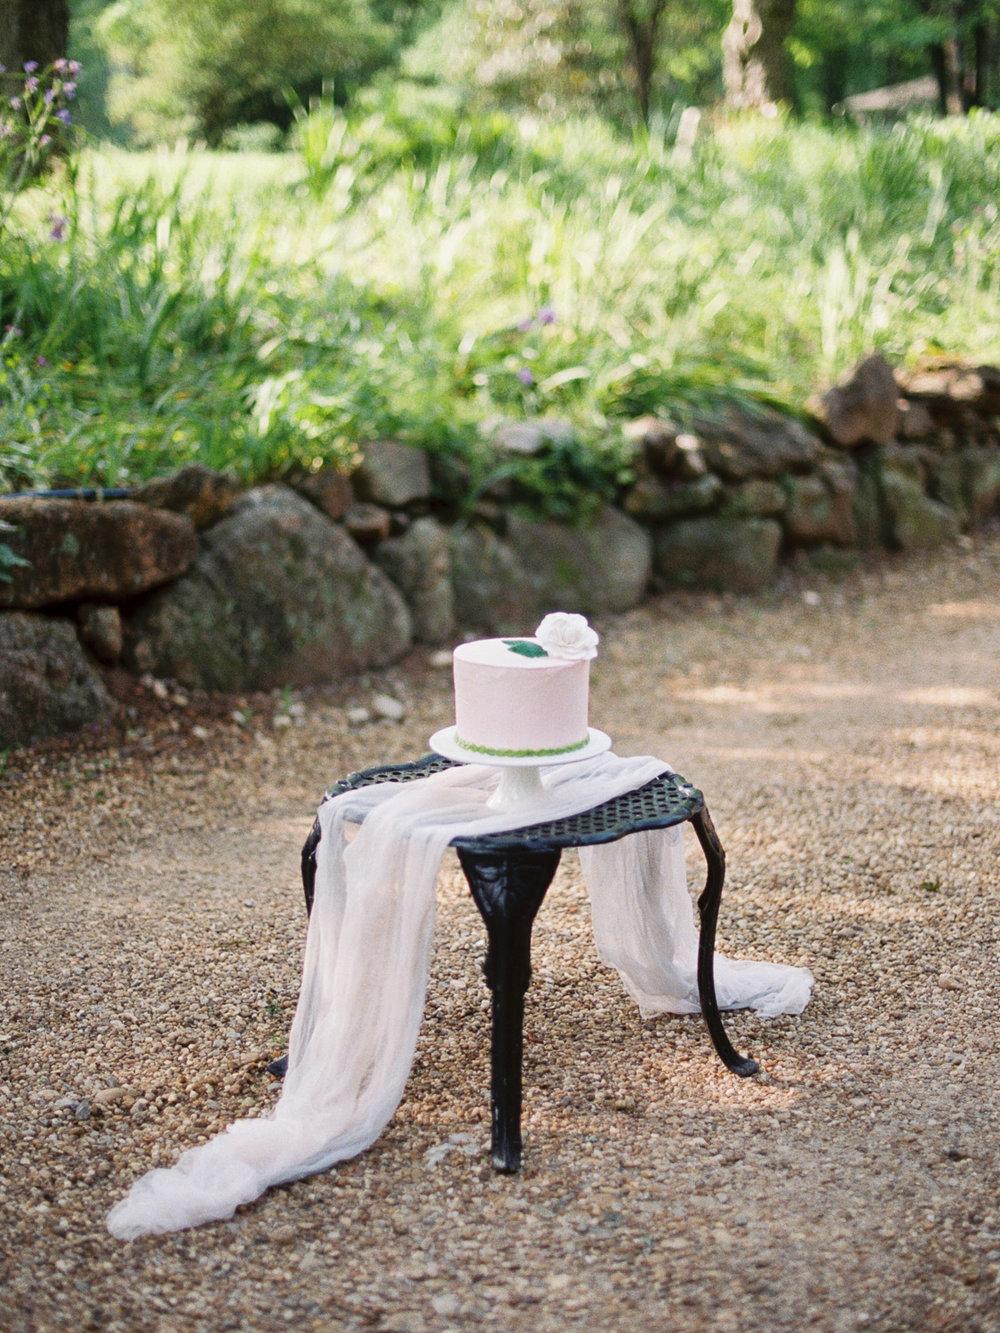 christinadavisphotography-romanticwedding-gardenweddinginspiration52.jpg